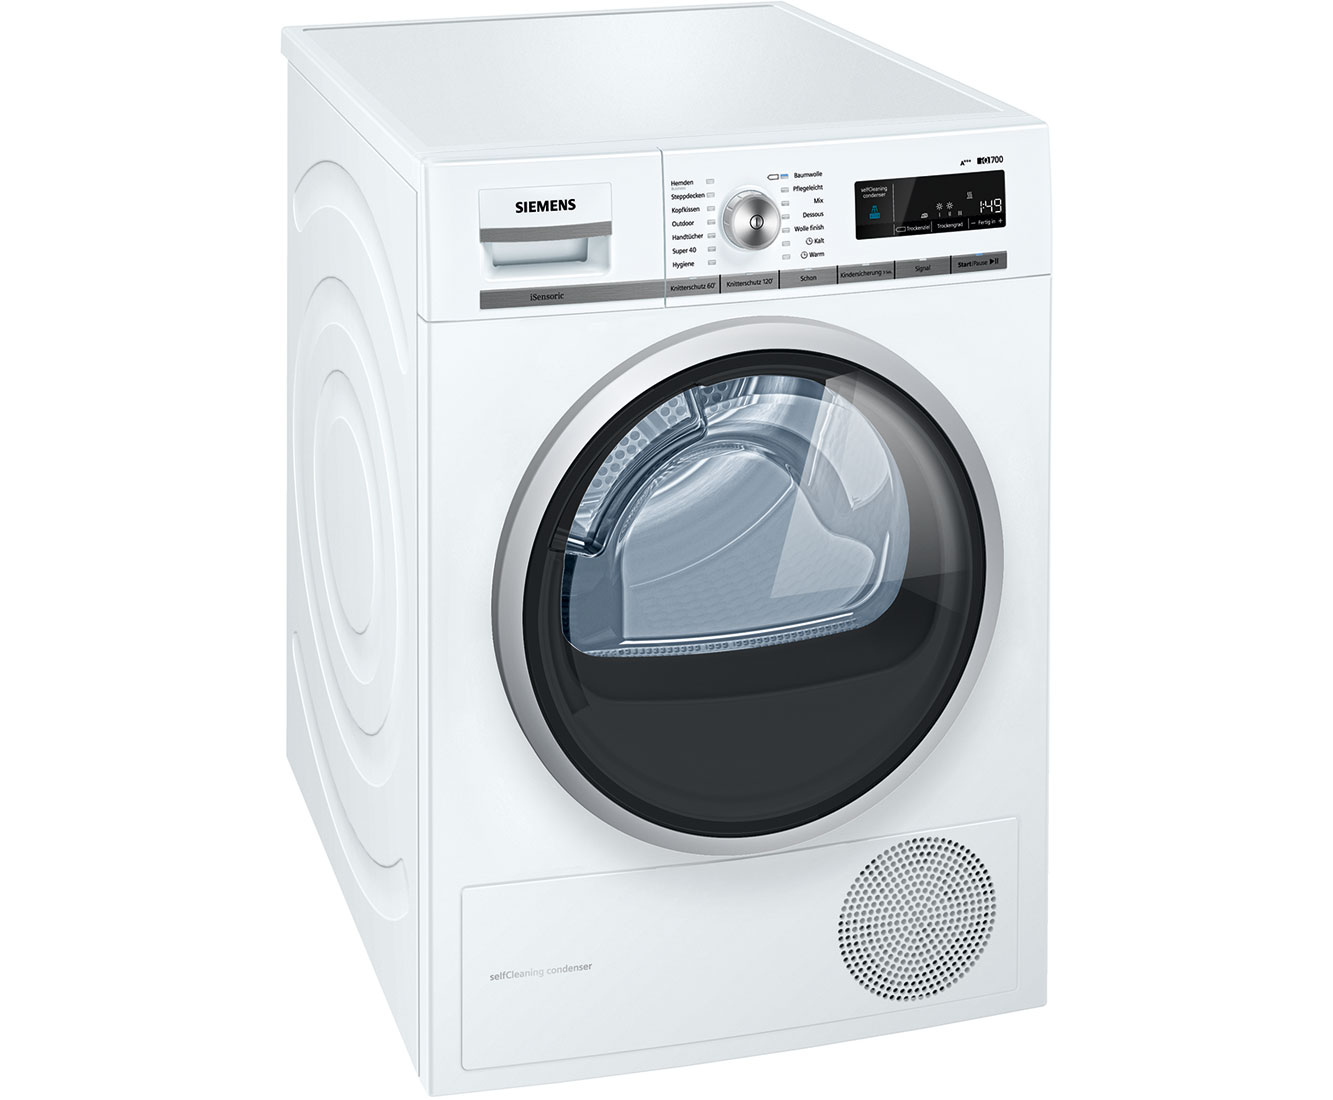 iQ700 WT47W5W0 Wärmepumpentrockner - Weiss